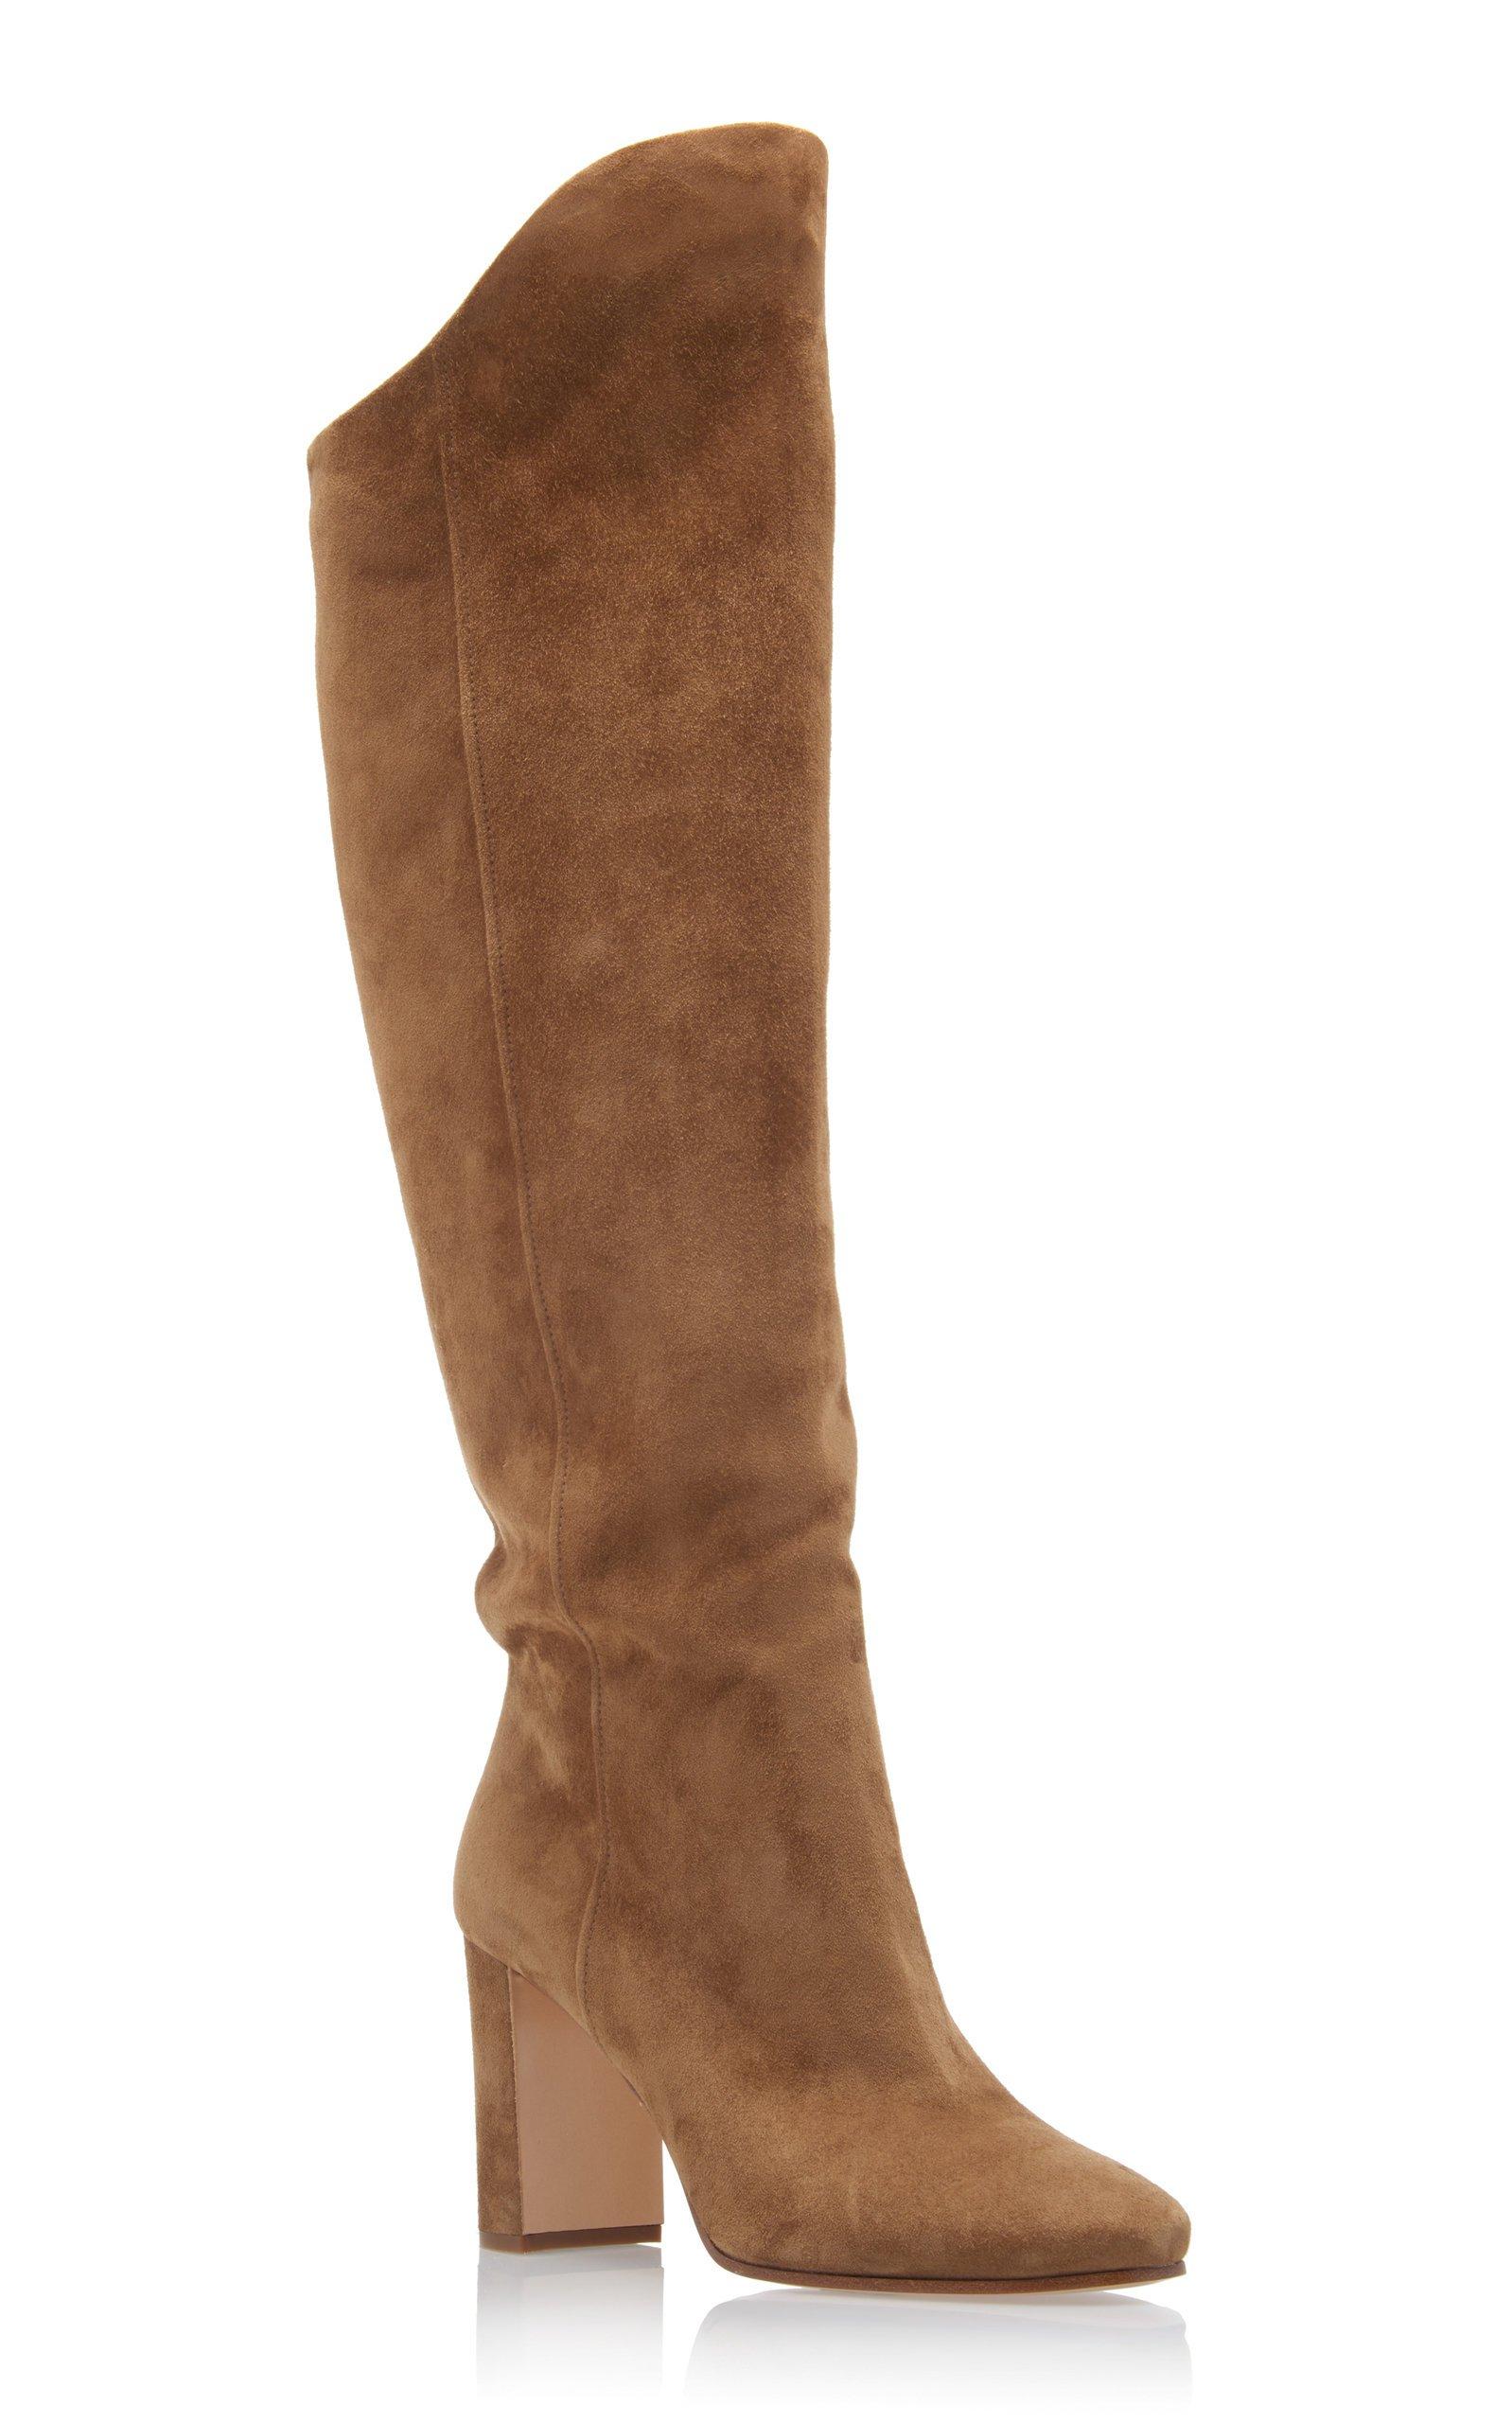 Suede Knee-High Boots by Prada | Moda Operandi